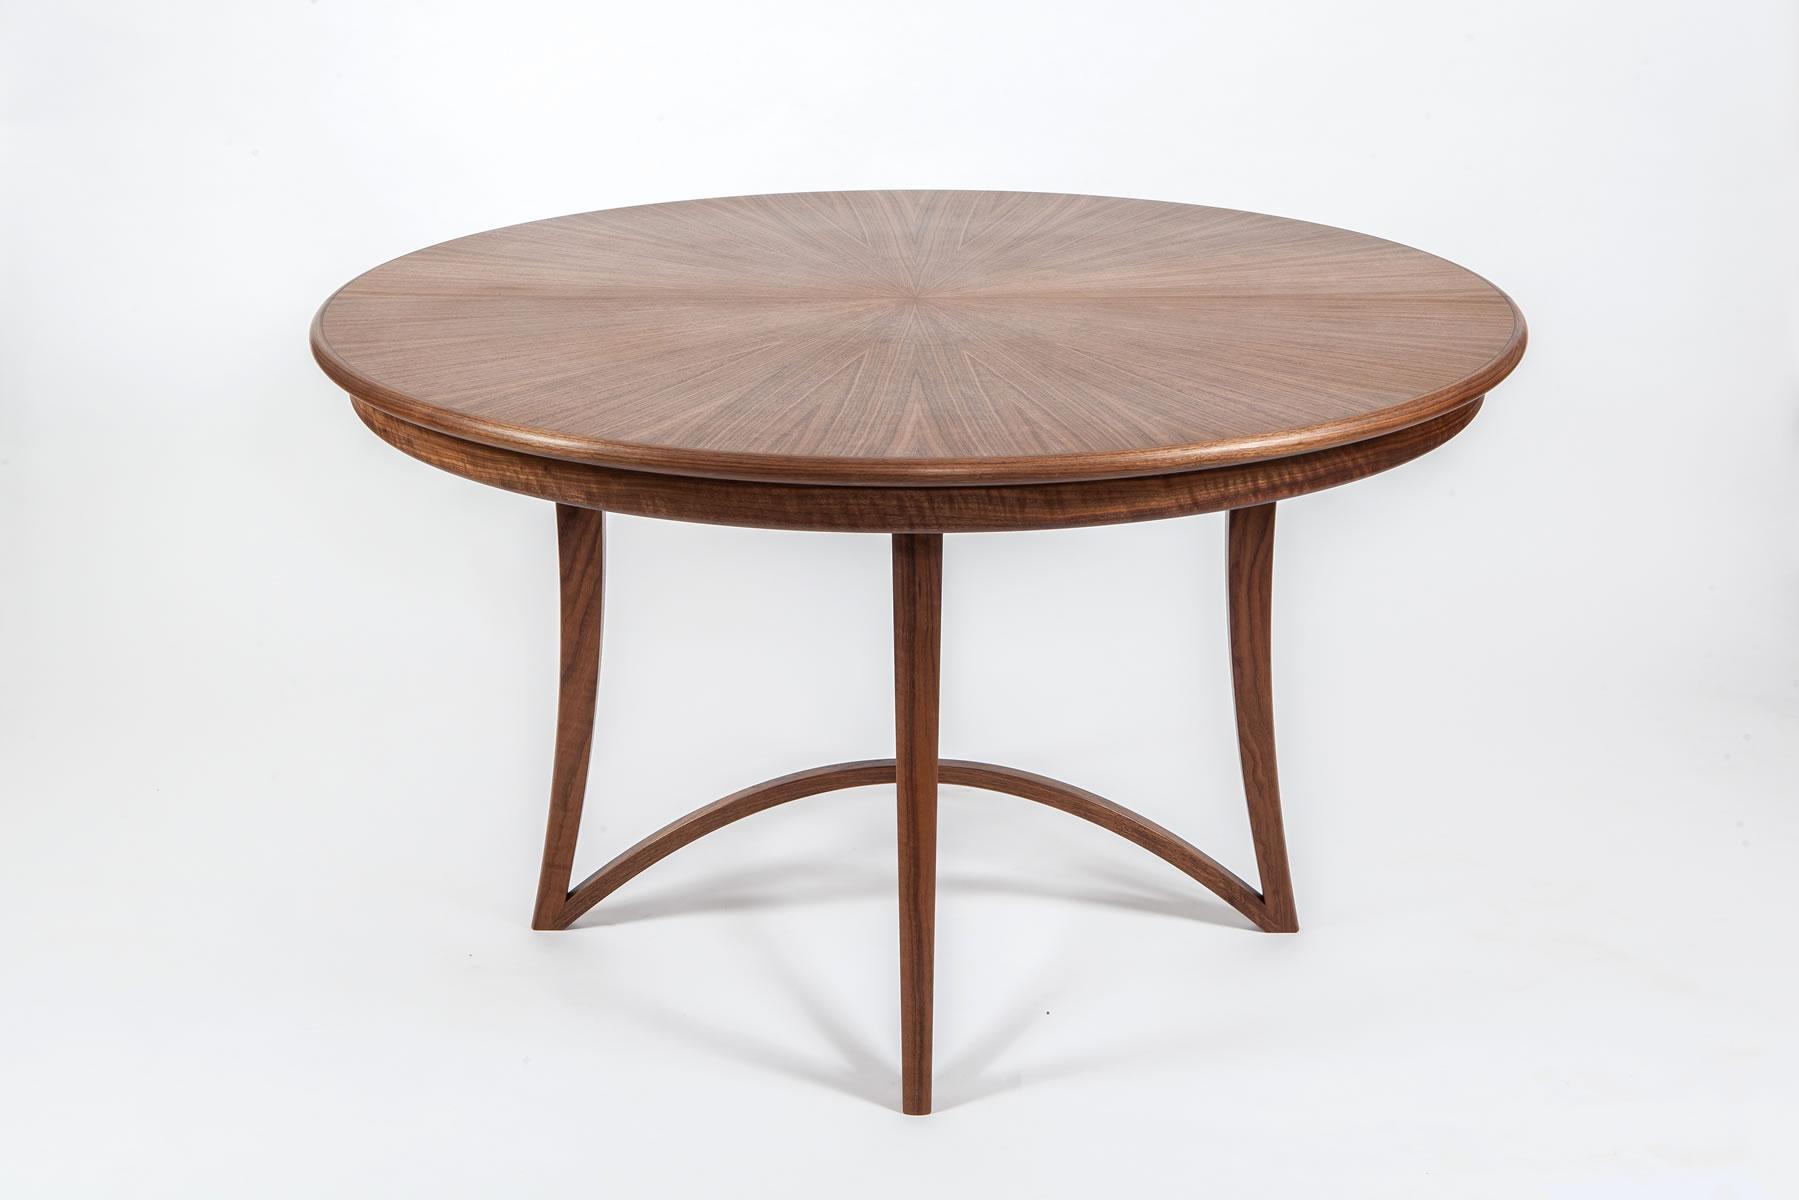 Dining Table - Edward Barnsley Workshop